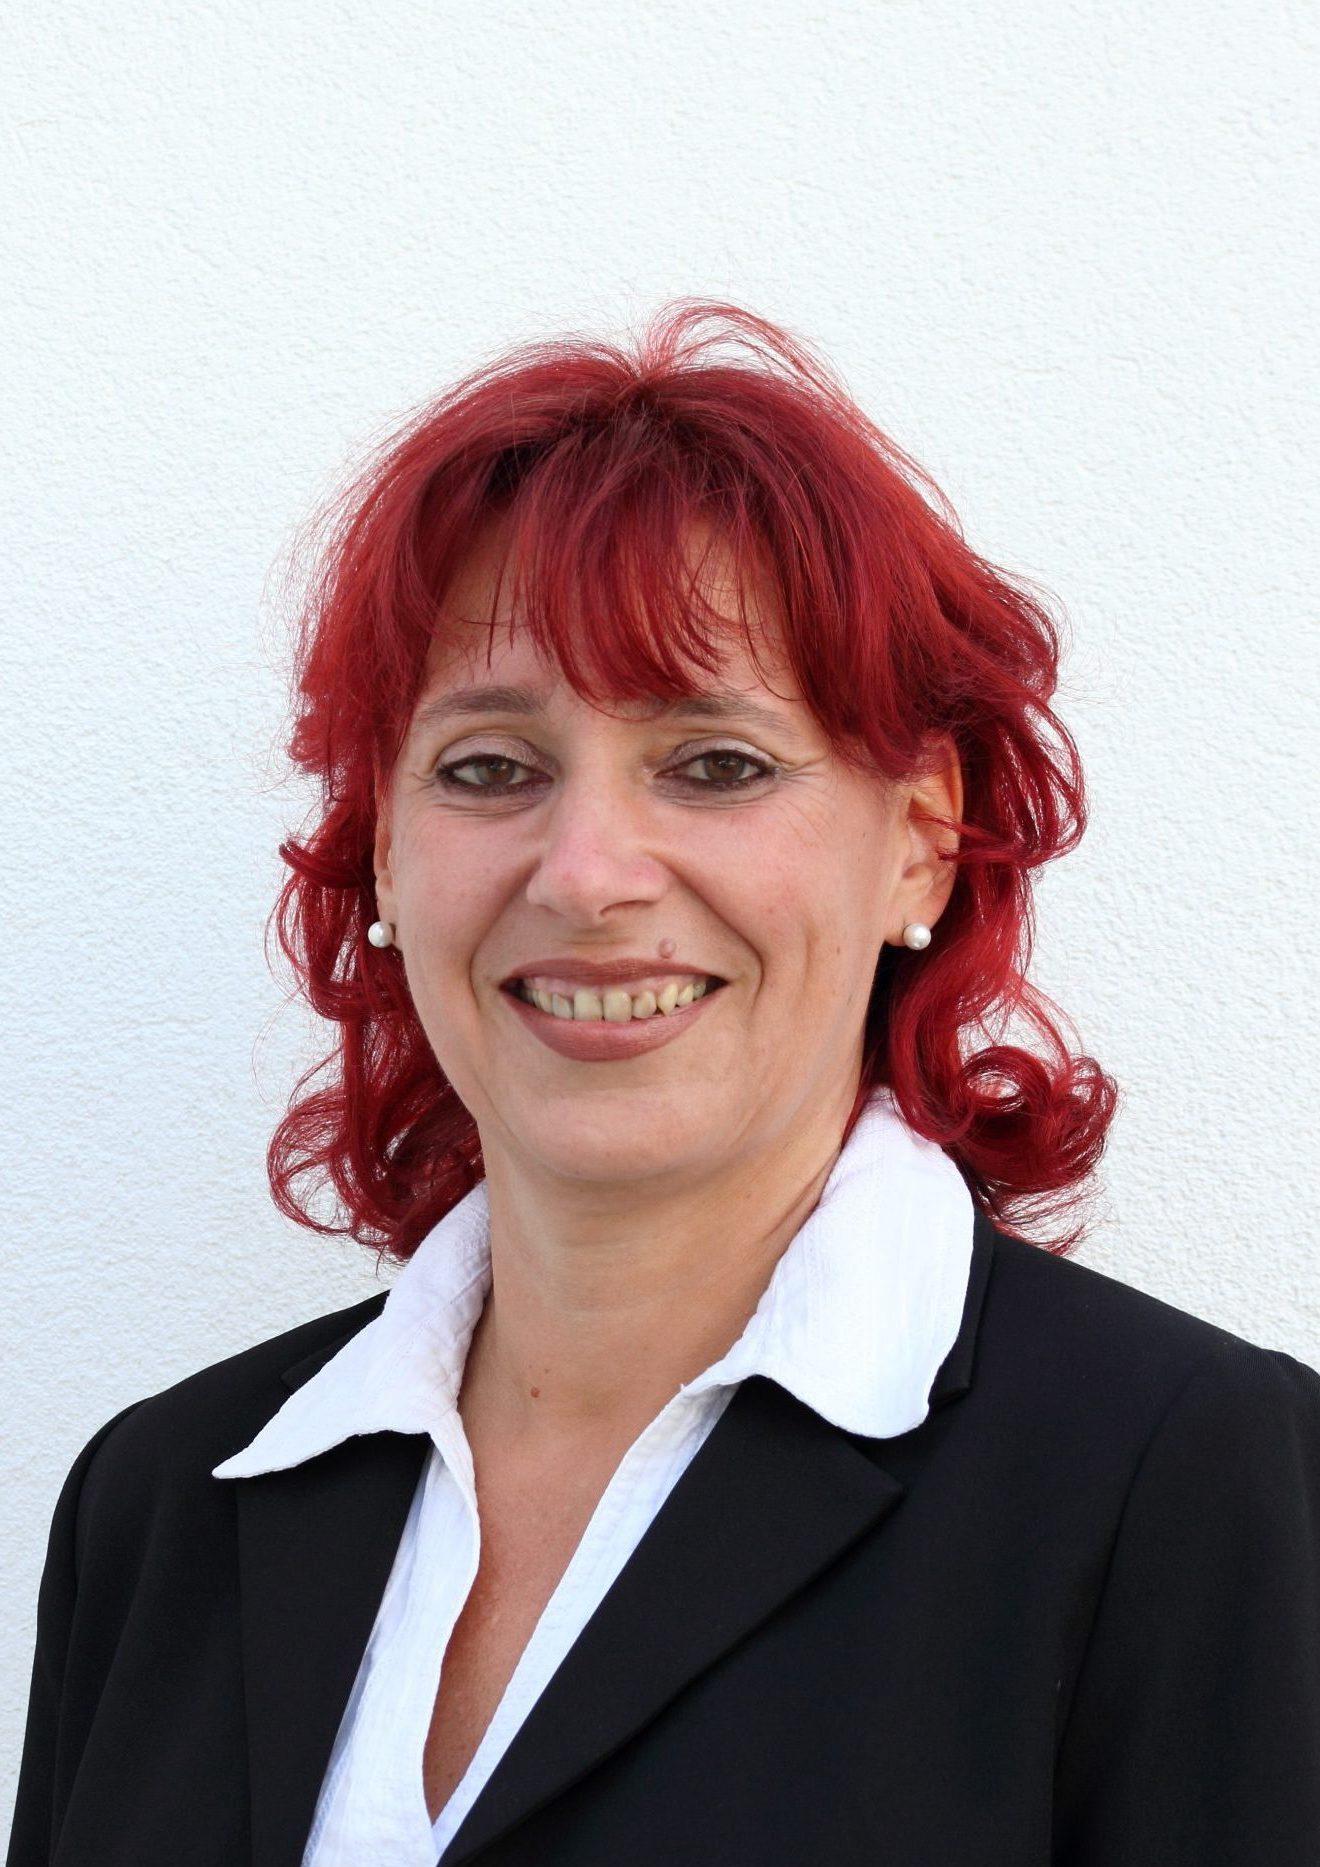 Silke Schmidt